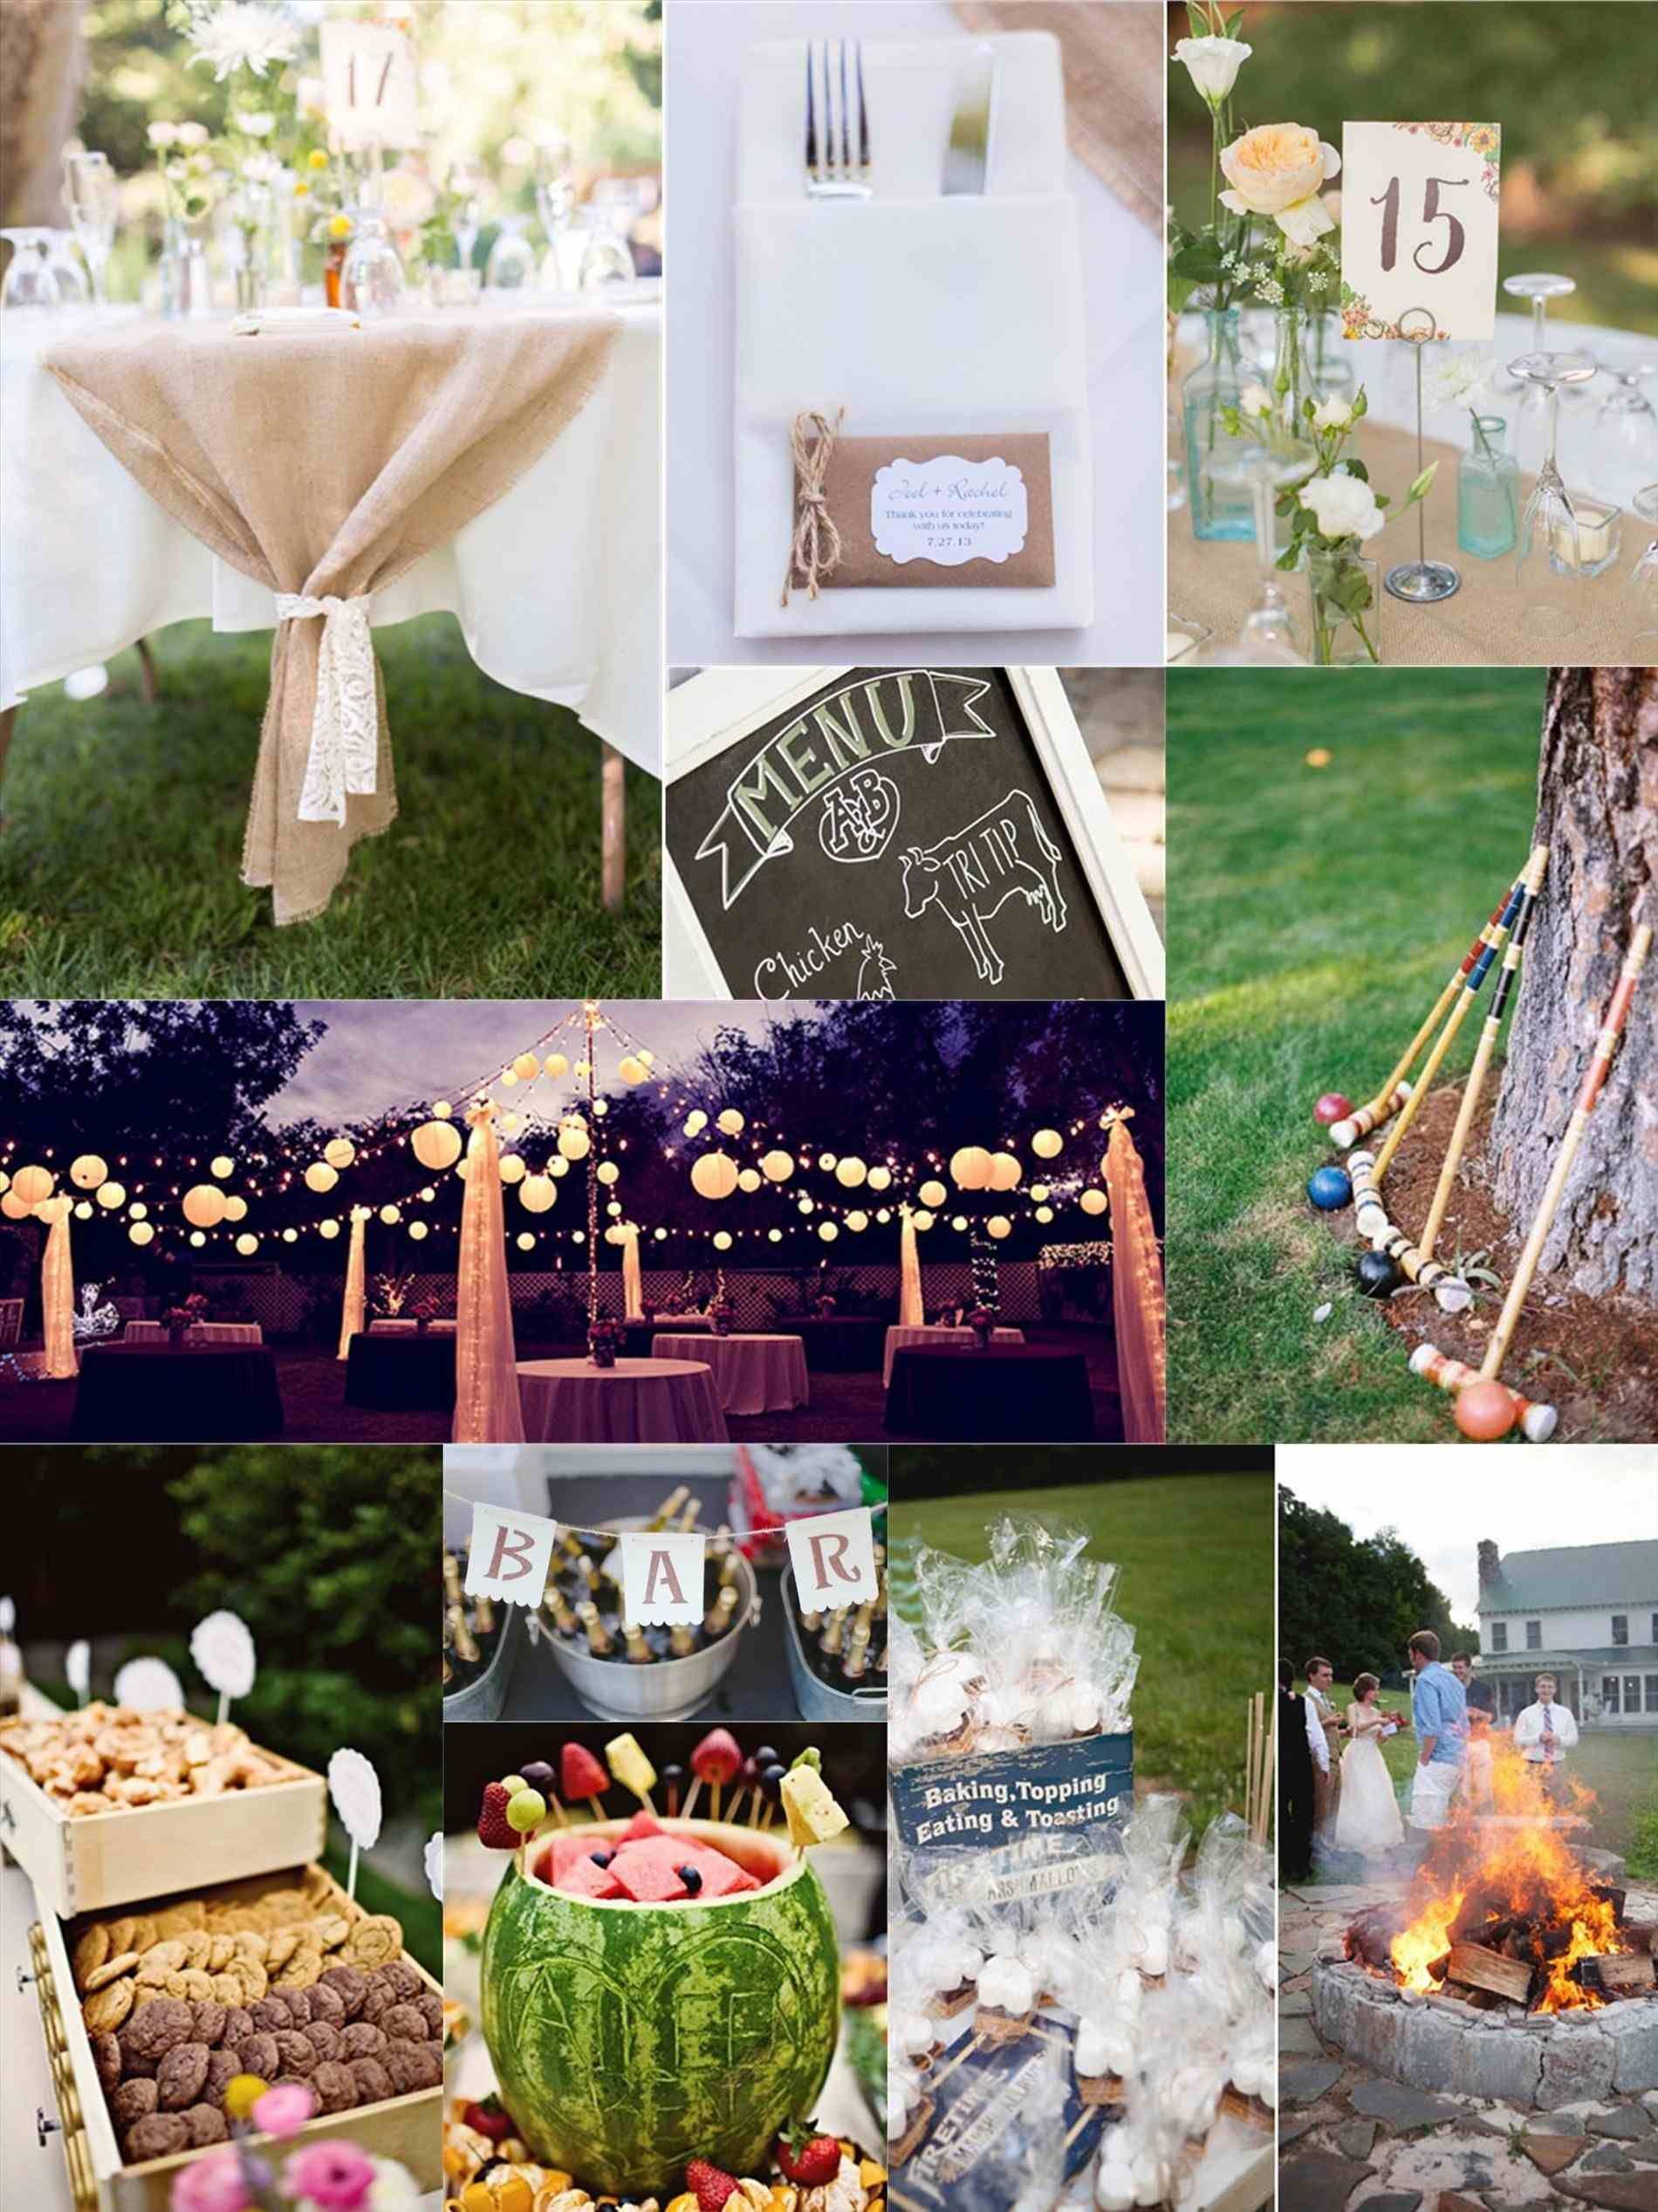 Backyard Wedding Reception Food Ideas | Cheap backyard ...